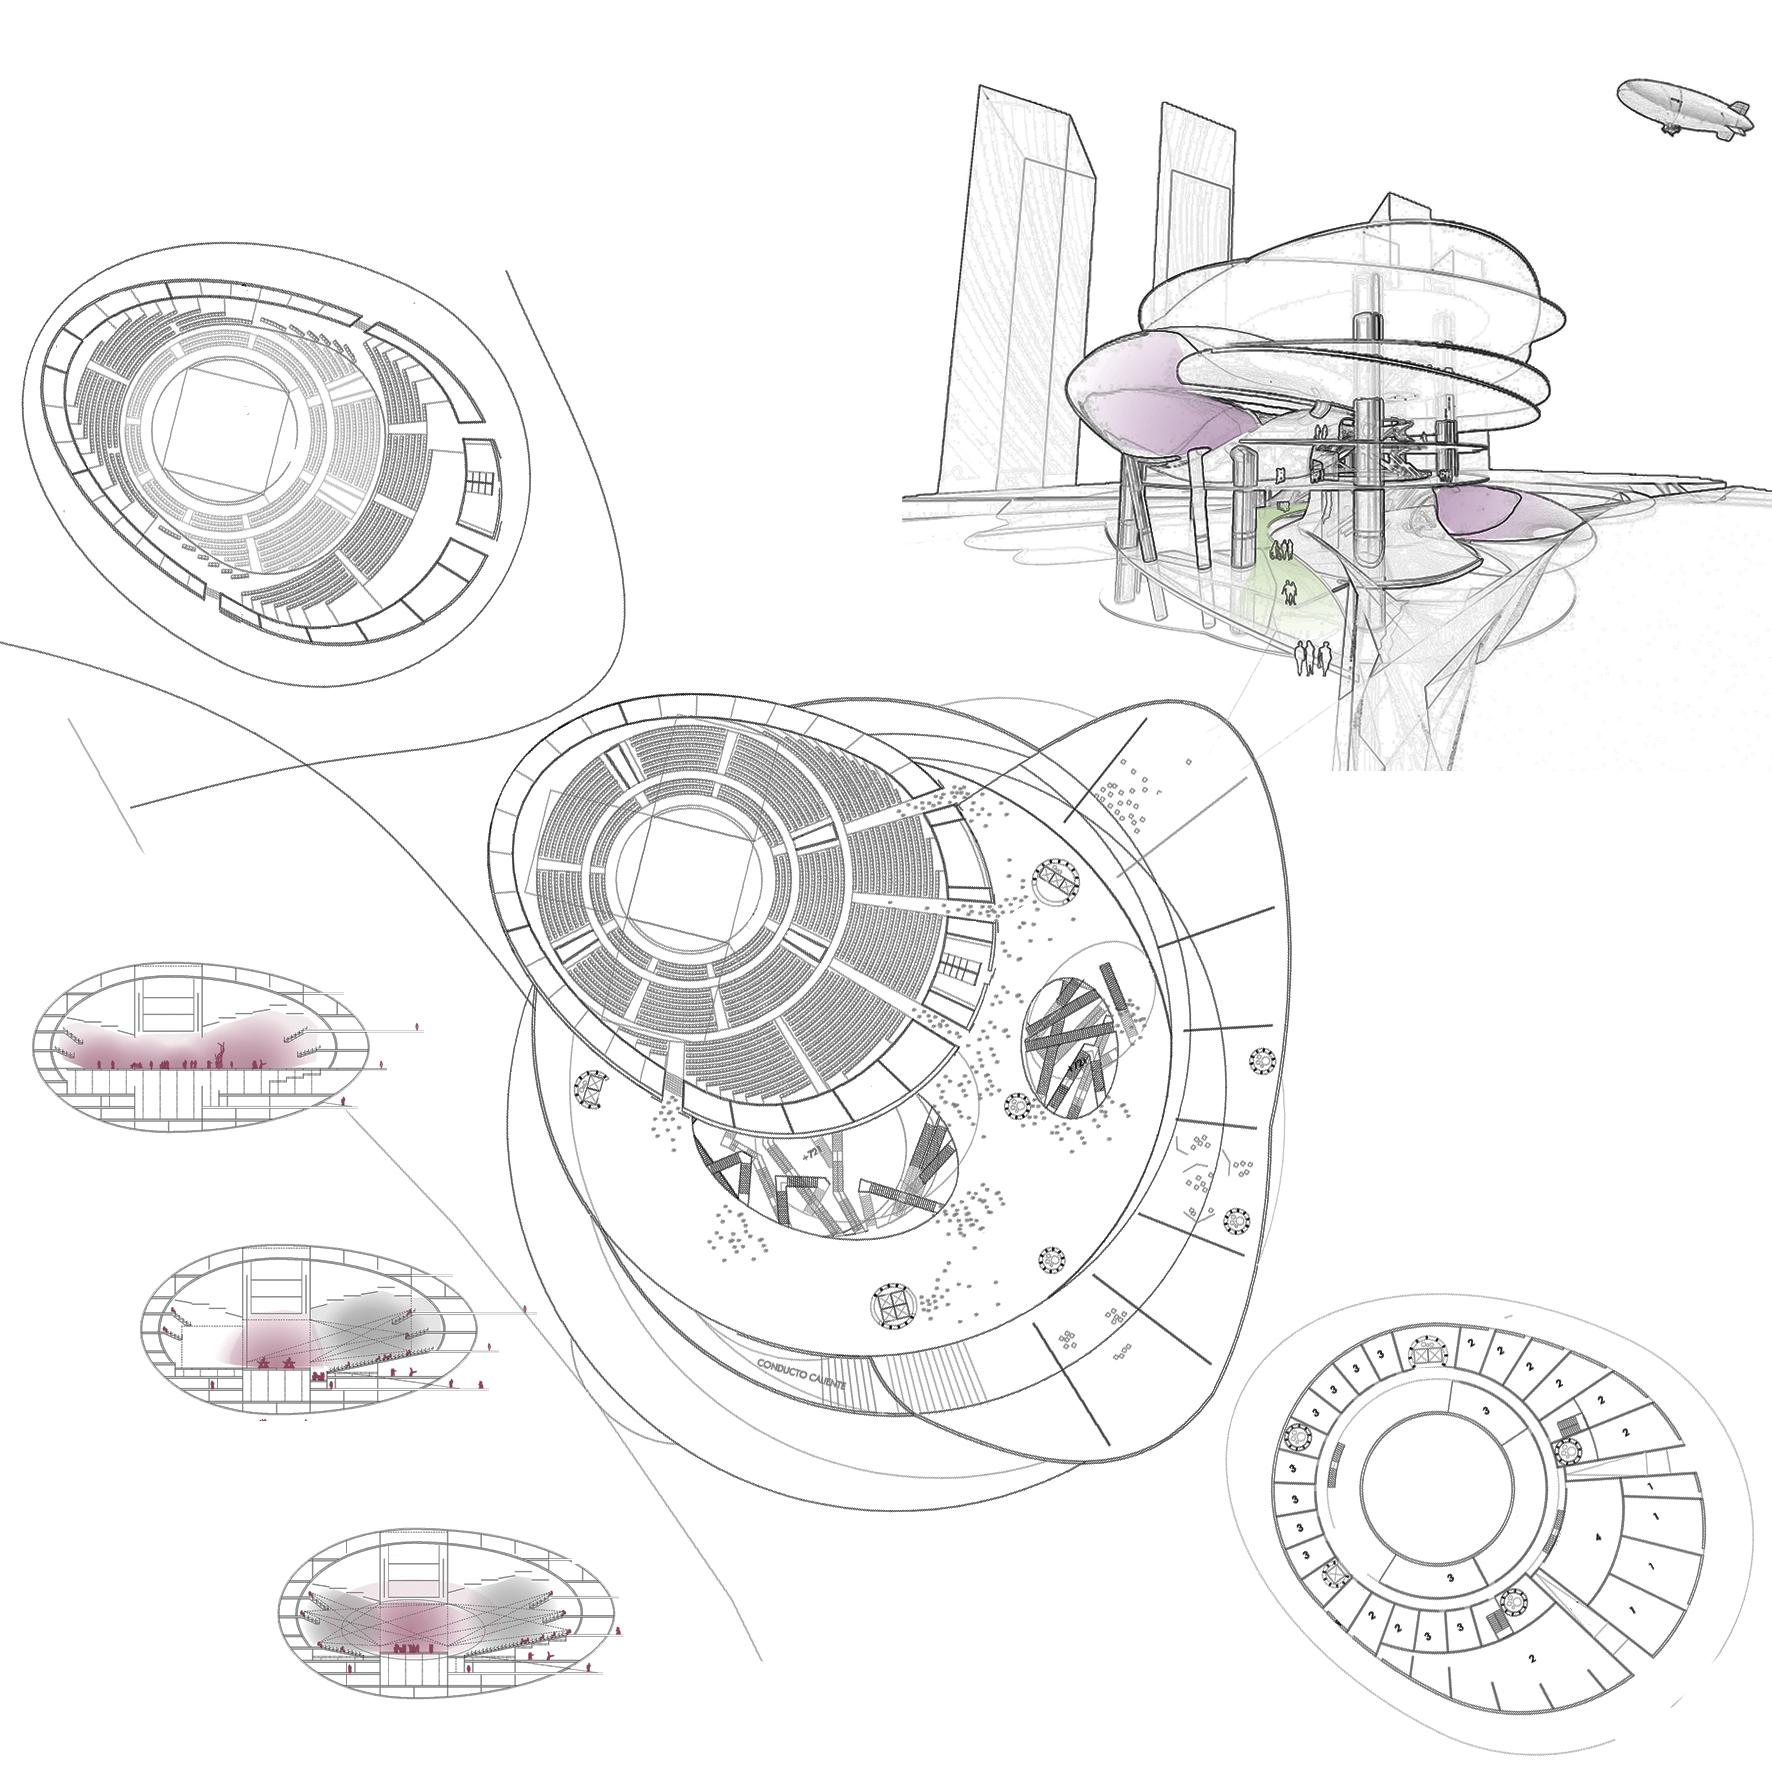 Visionary Designs